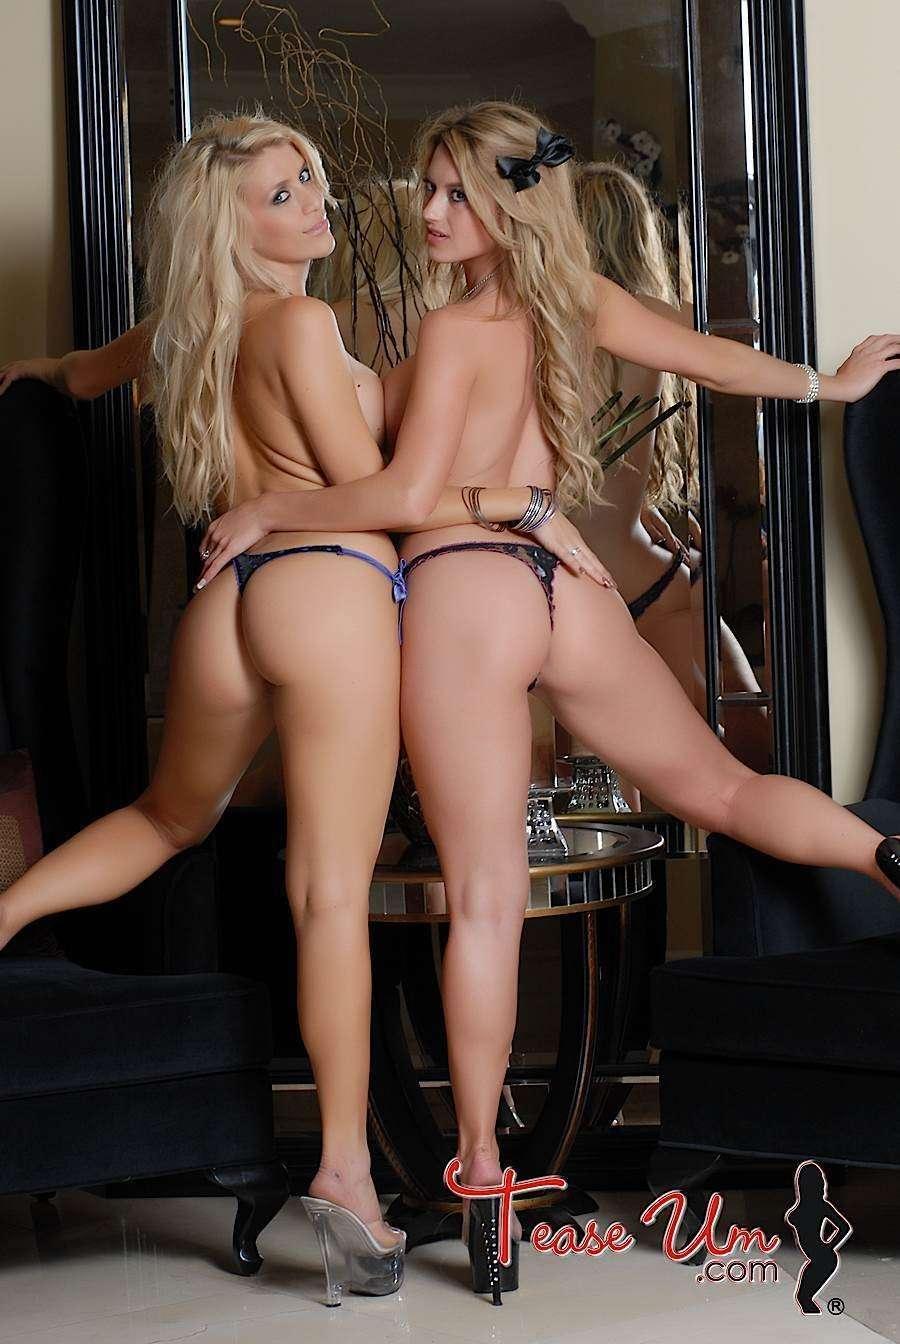 Dawnielle Royalty busty topless bikini girls thumb 2